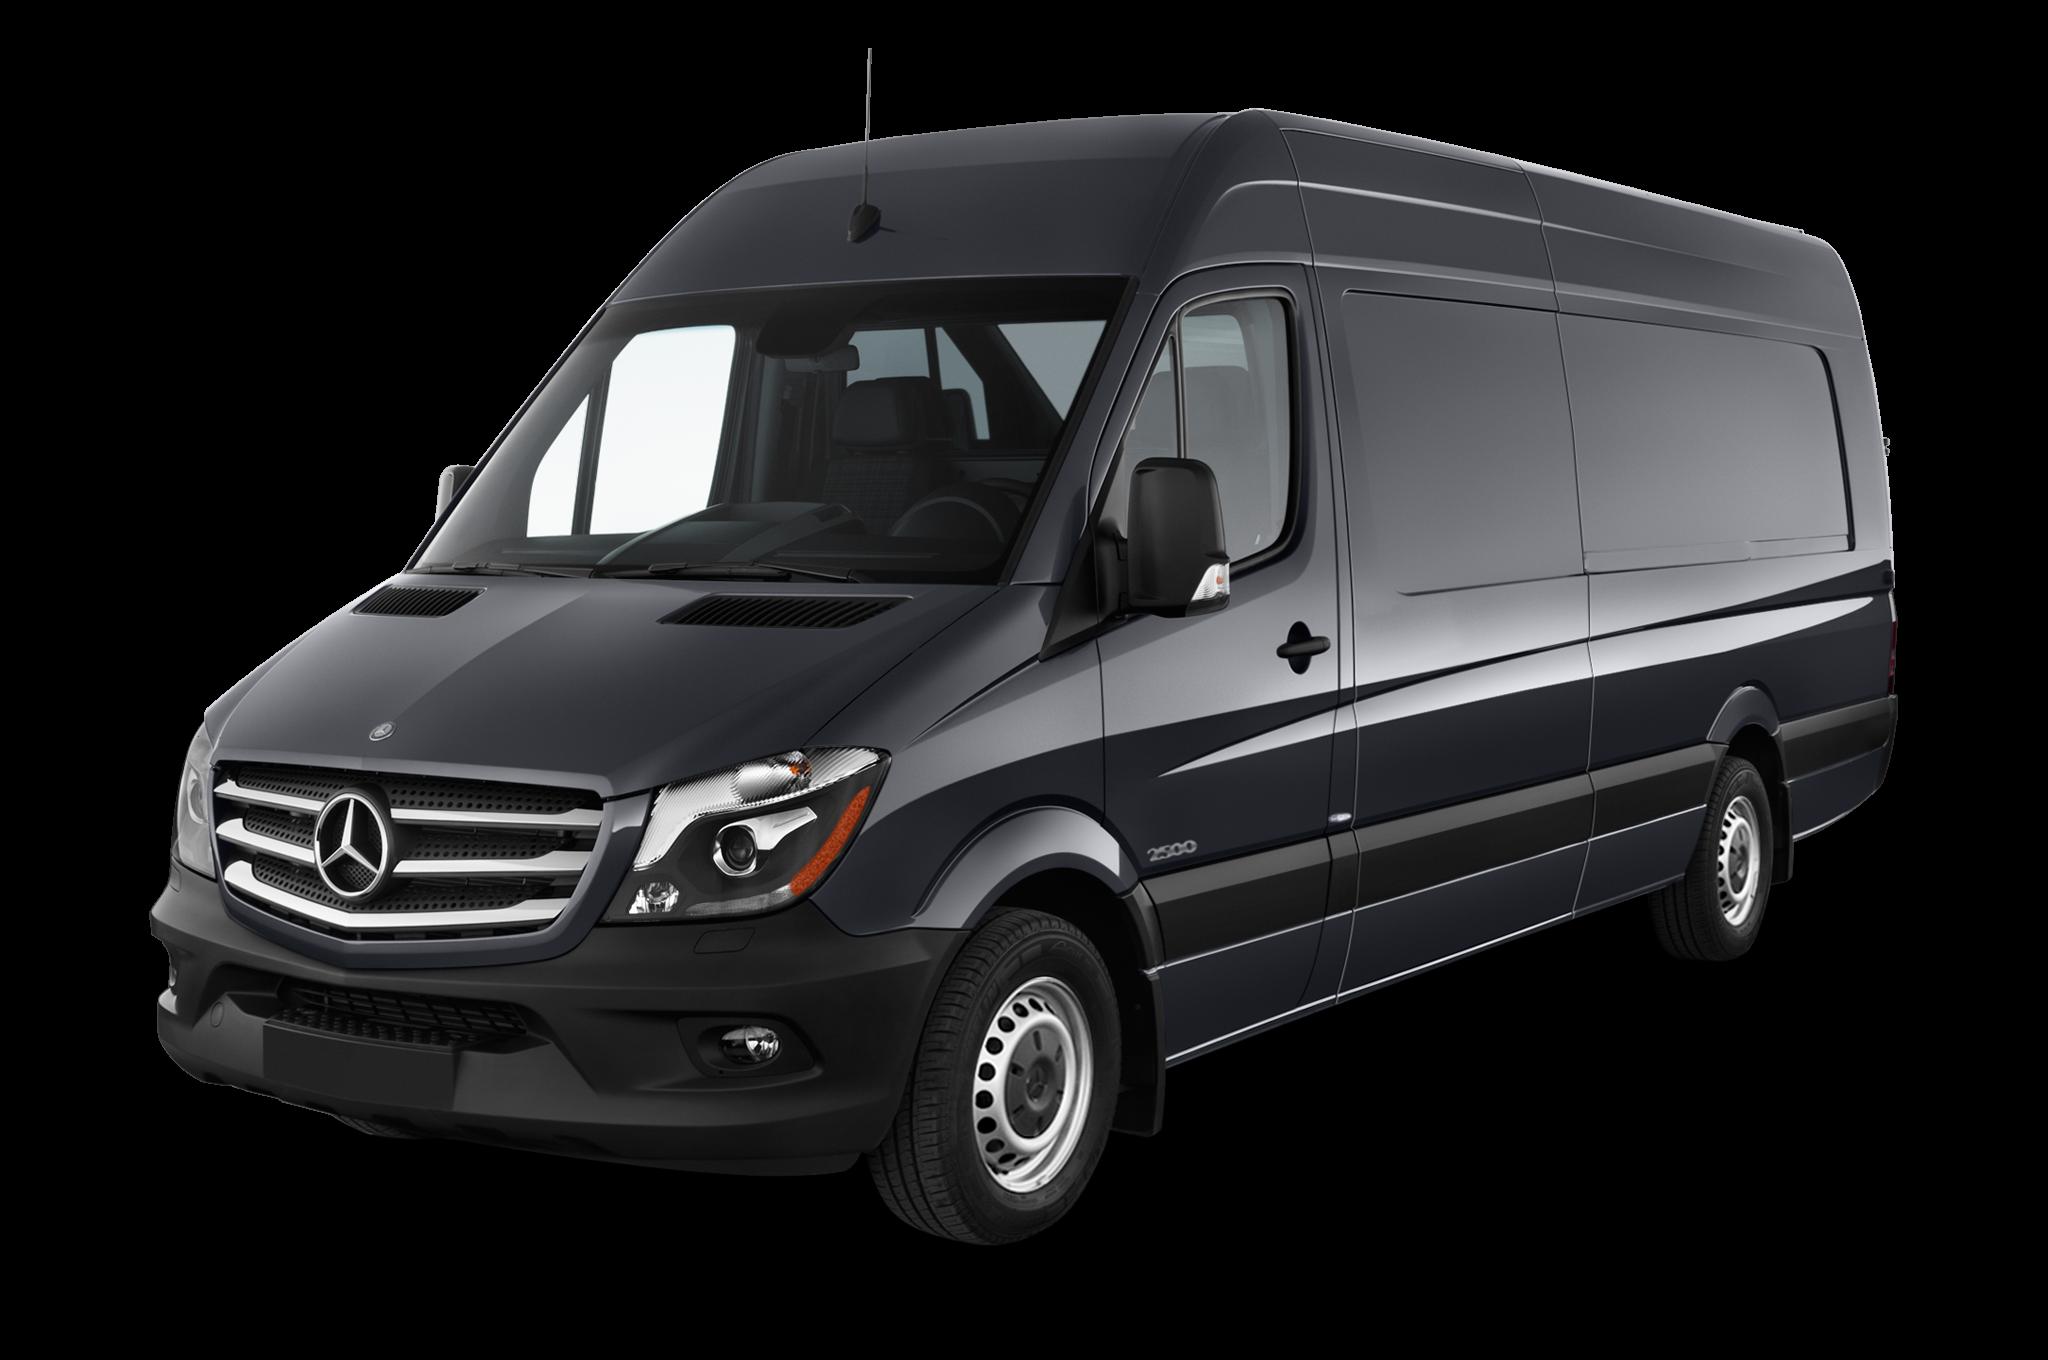 van dressed price metris review benz mercedes reviews cargo sharp